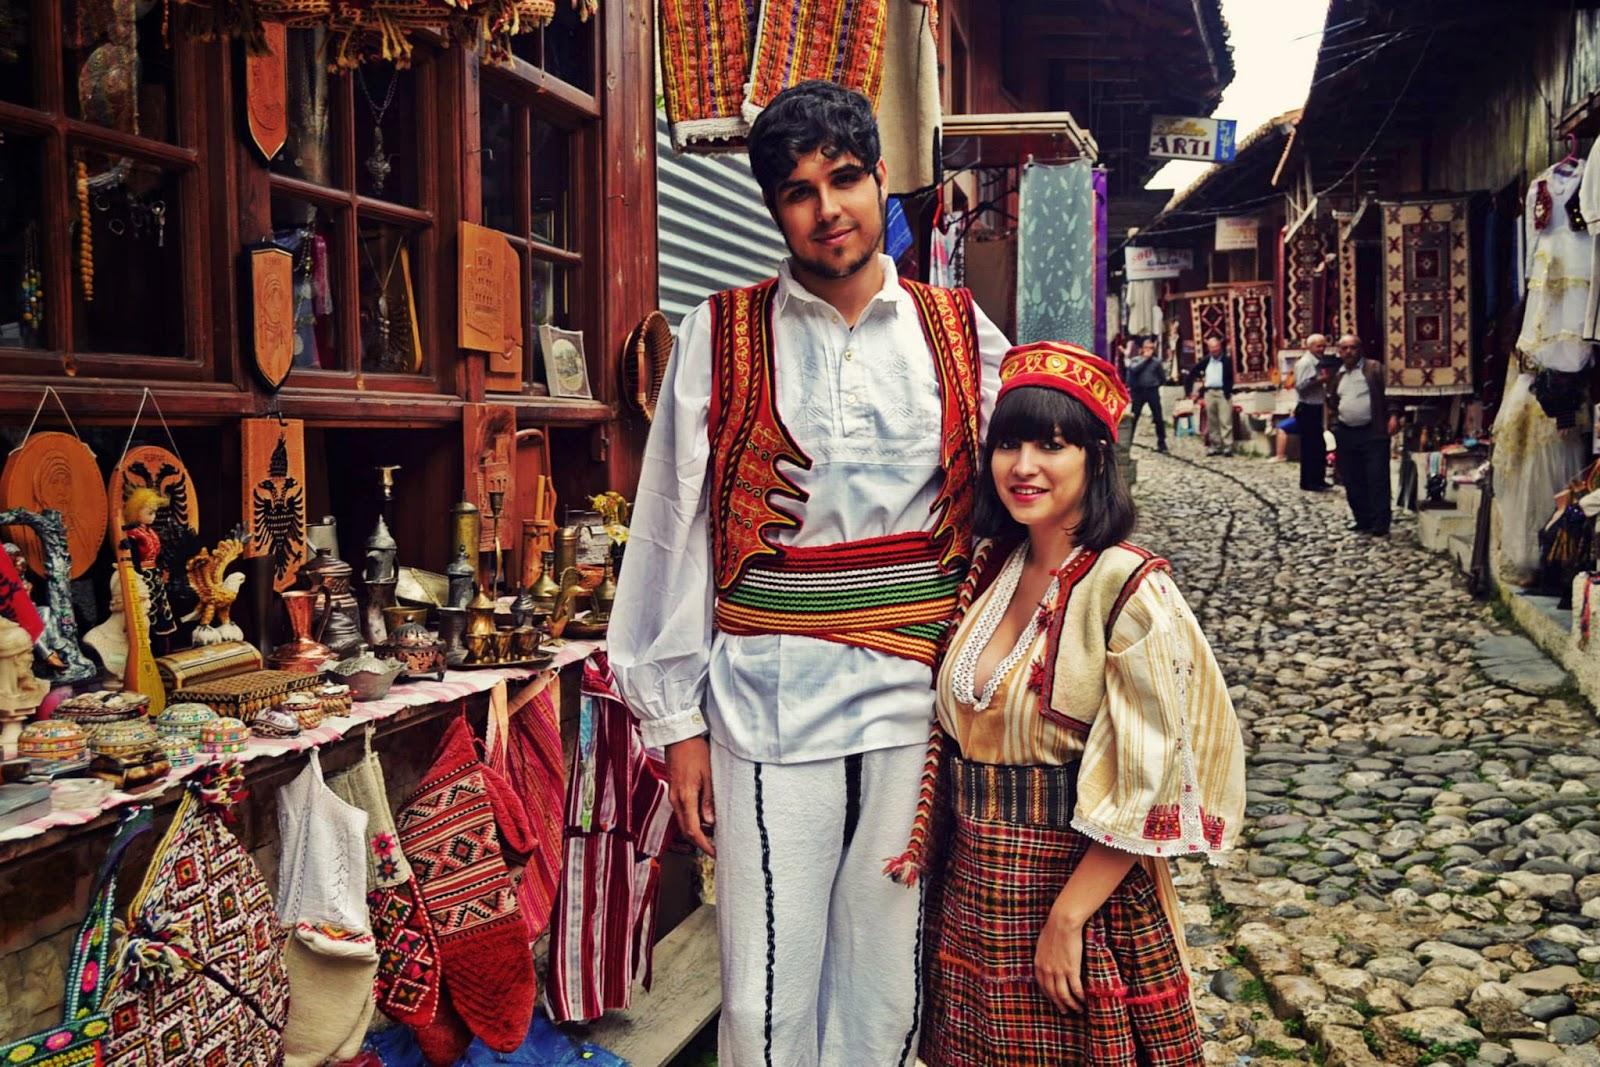 Rutas en coche por europa ruta atravesando albania desde - Tenderos de ropa ...